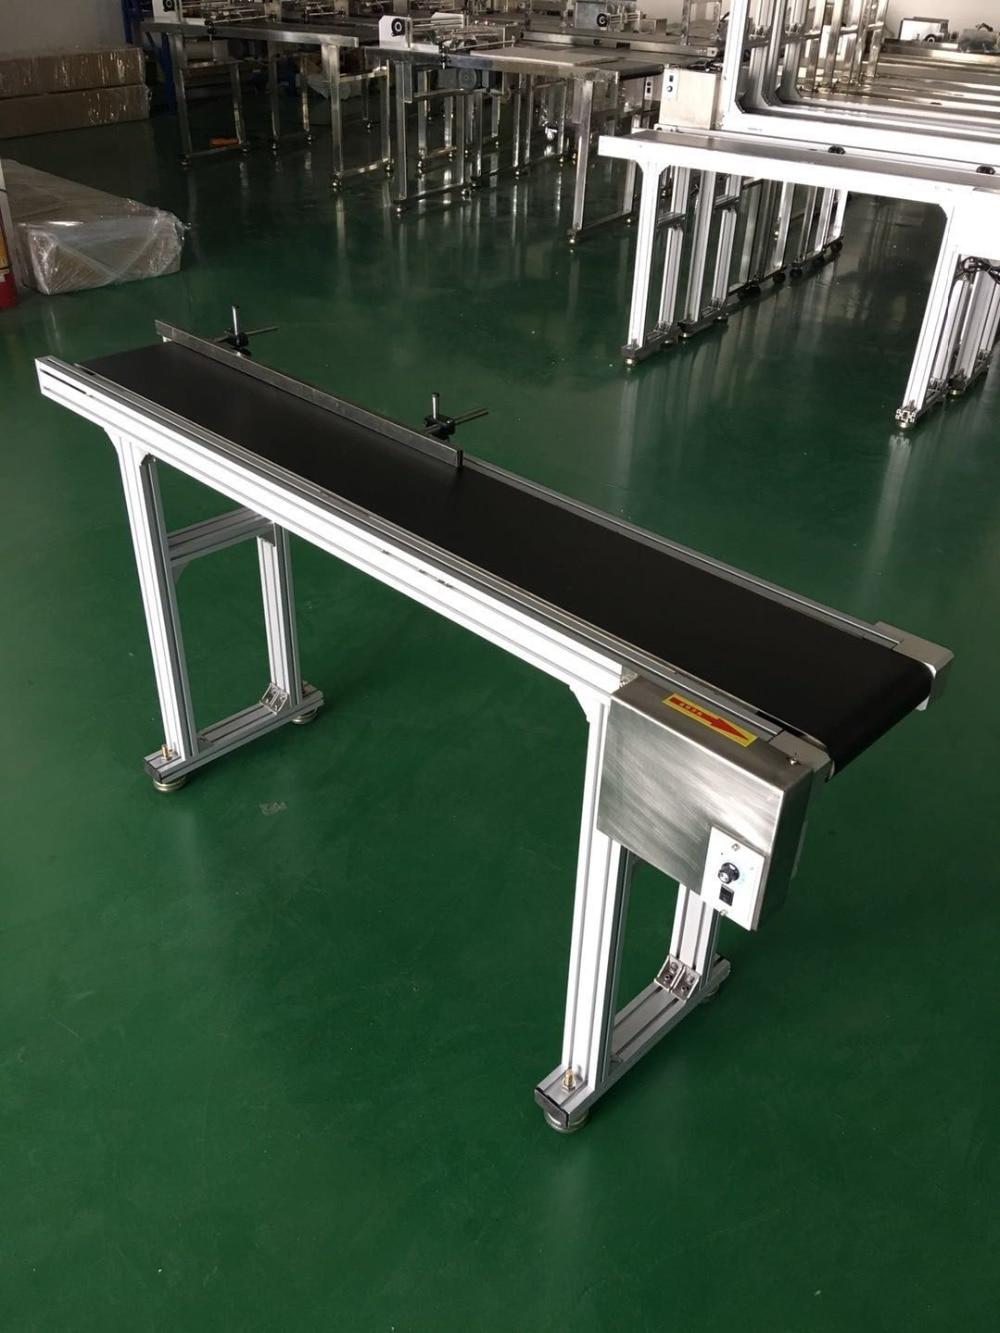 Inkjet coding printer Stainless Steel/ Aluminum Bottle Conveyor Belt/Box/Bag/Sticker, 200 mm Width, 5-30 m/min Adjustable